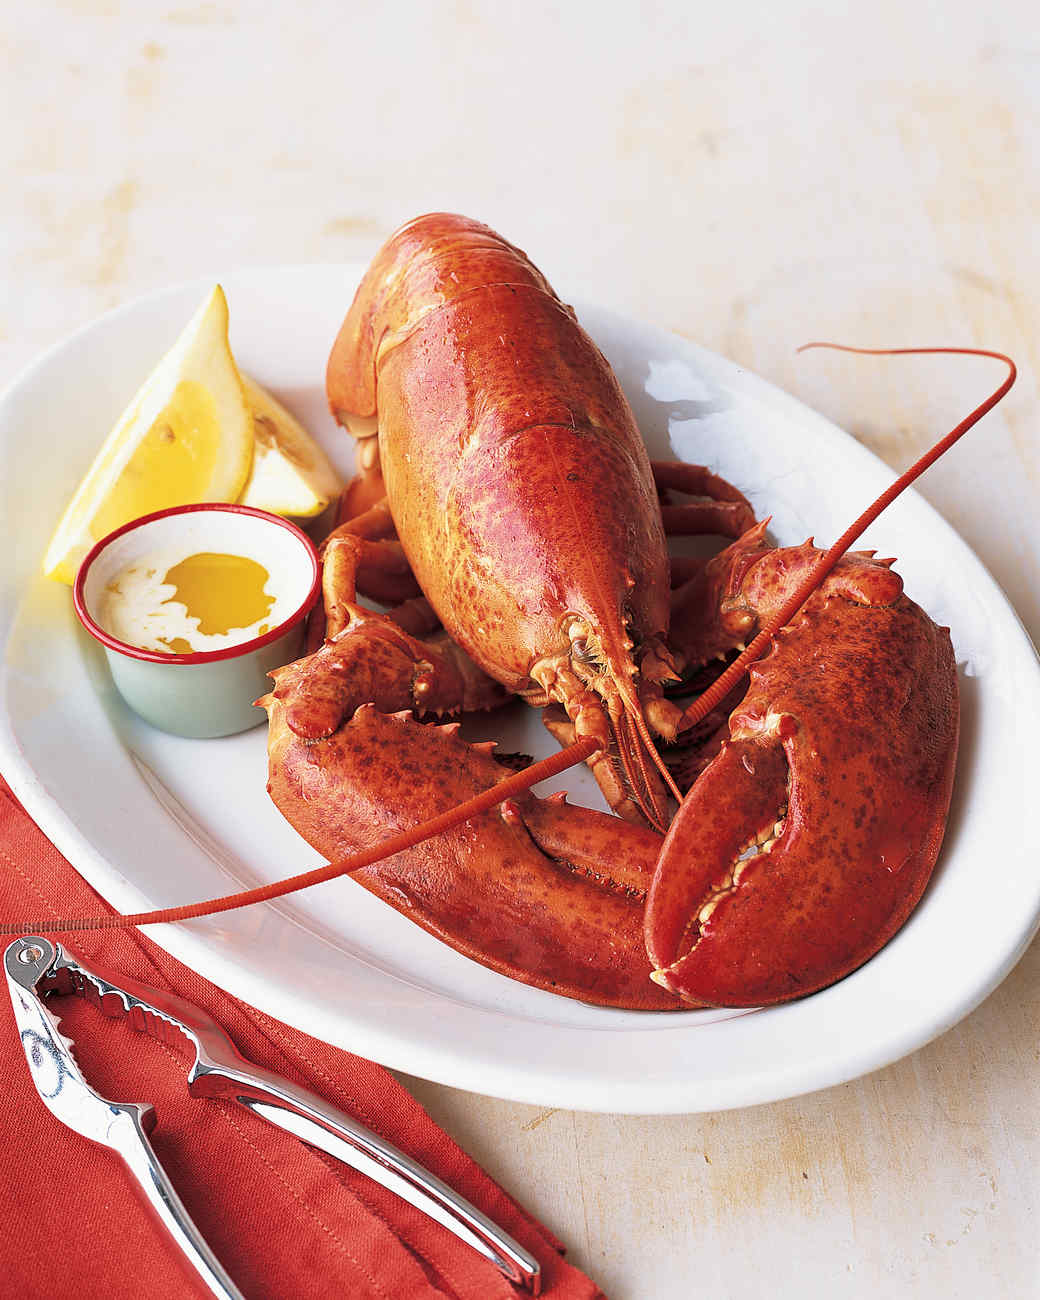 lobster-0704-mla100364.jpg